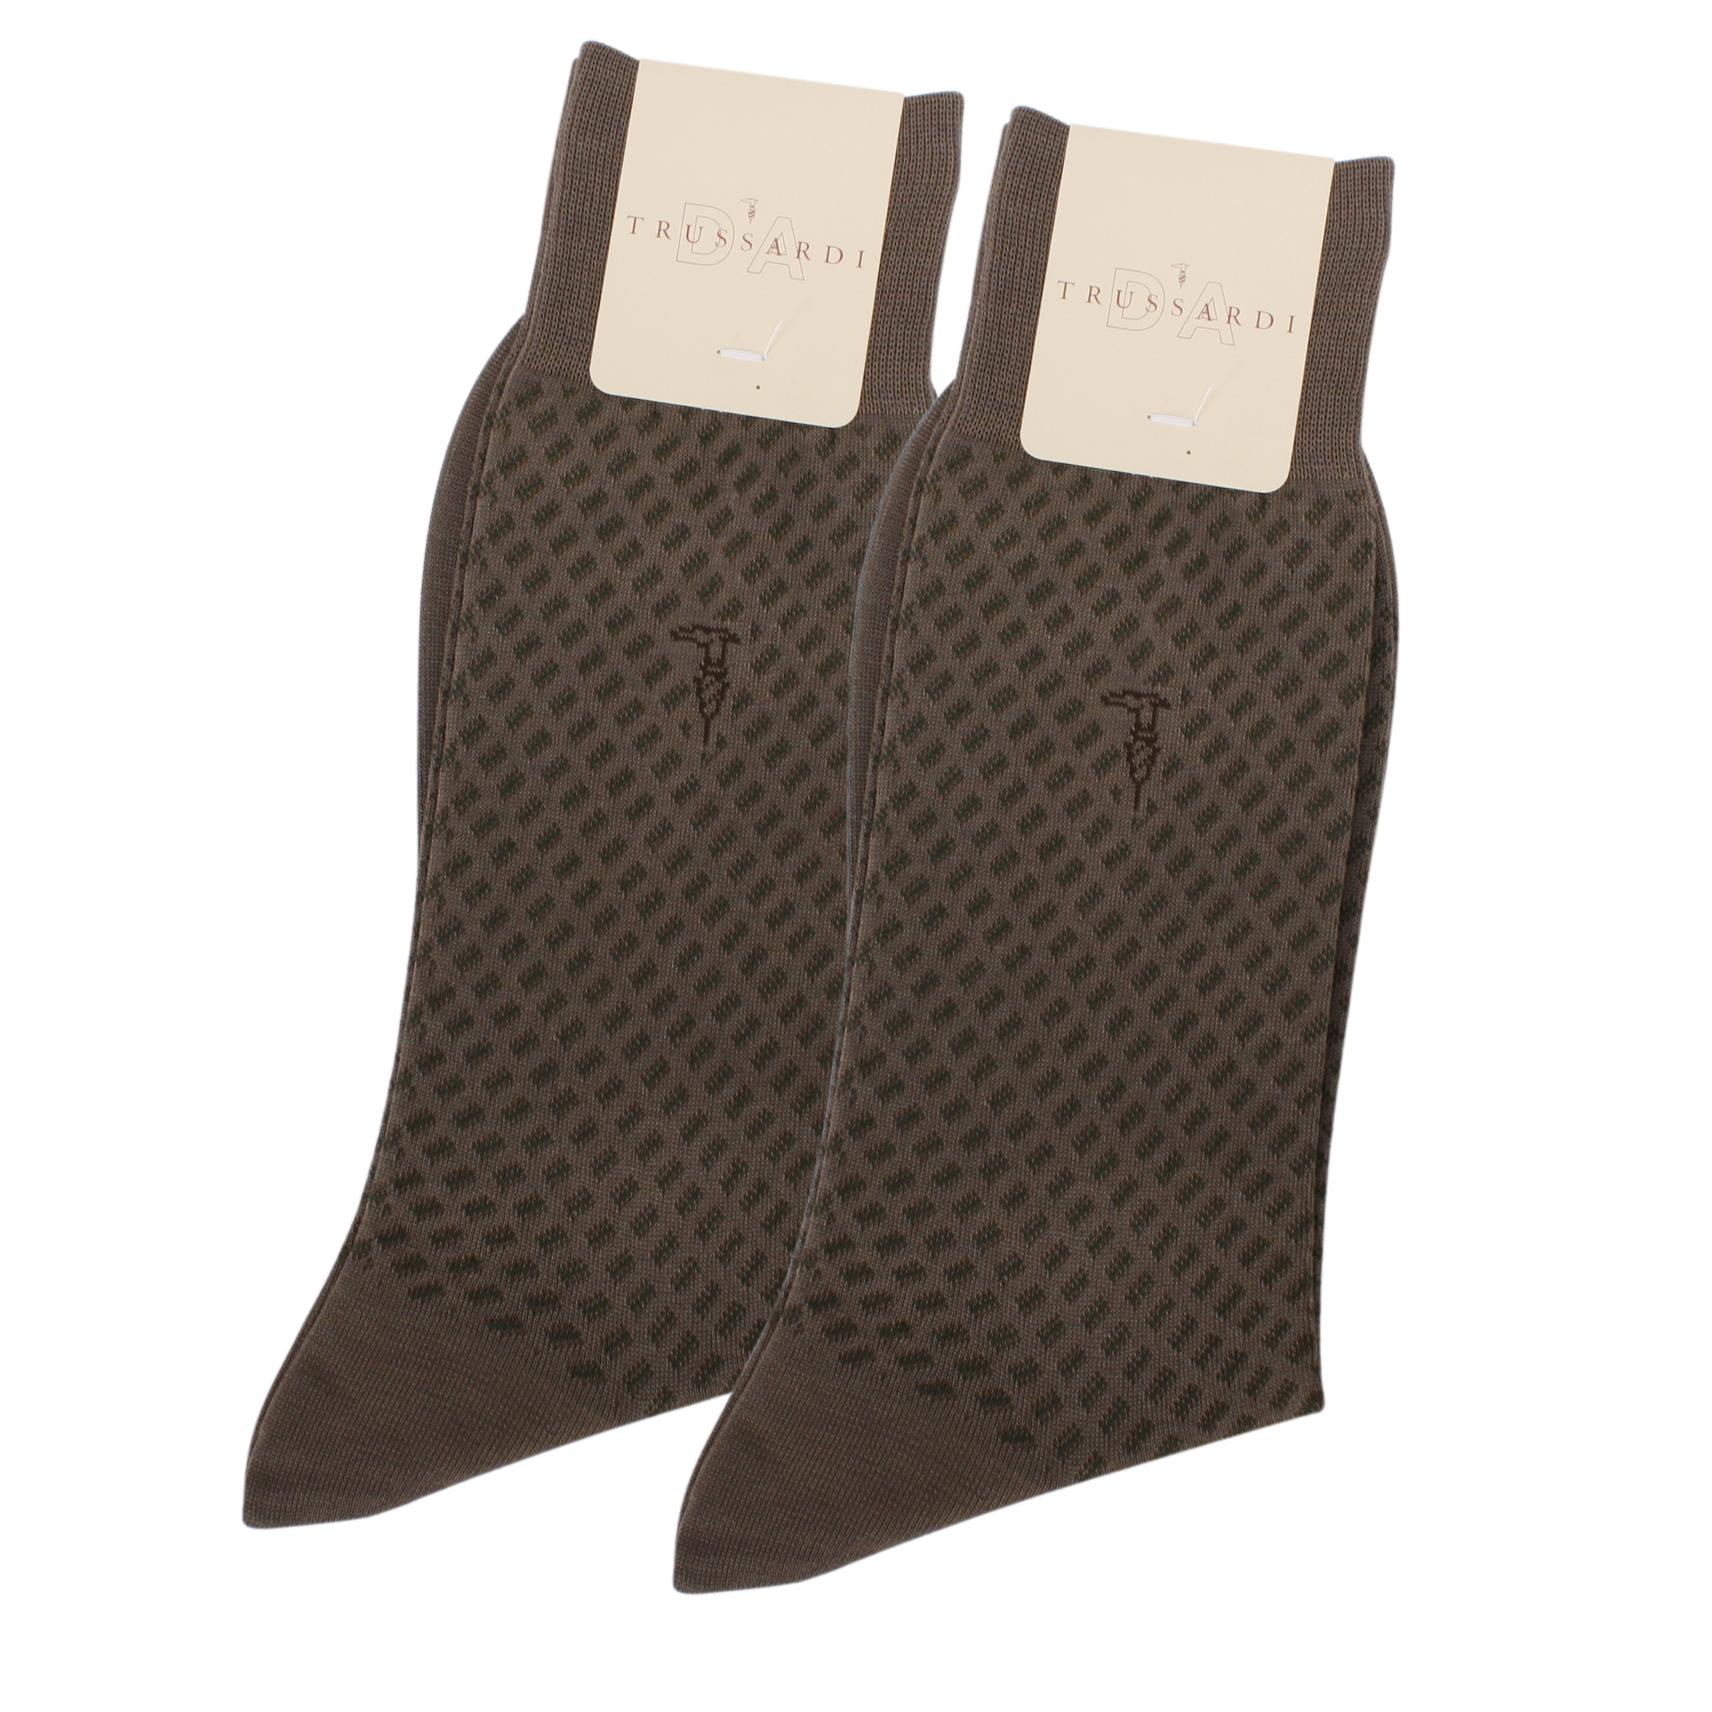 TRUSSARDI 滿版斜格紳士襪【橄欖色2入】